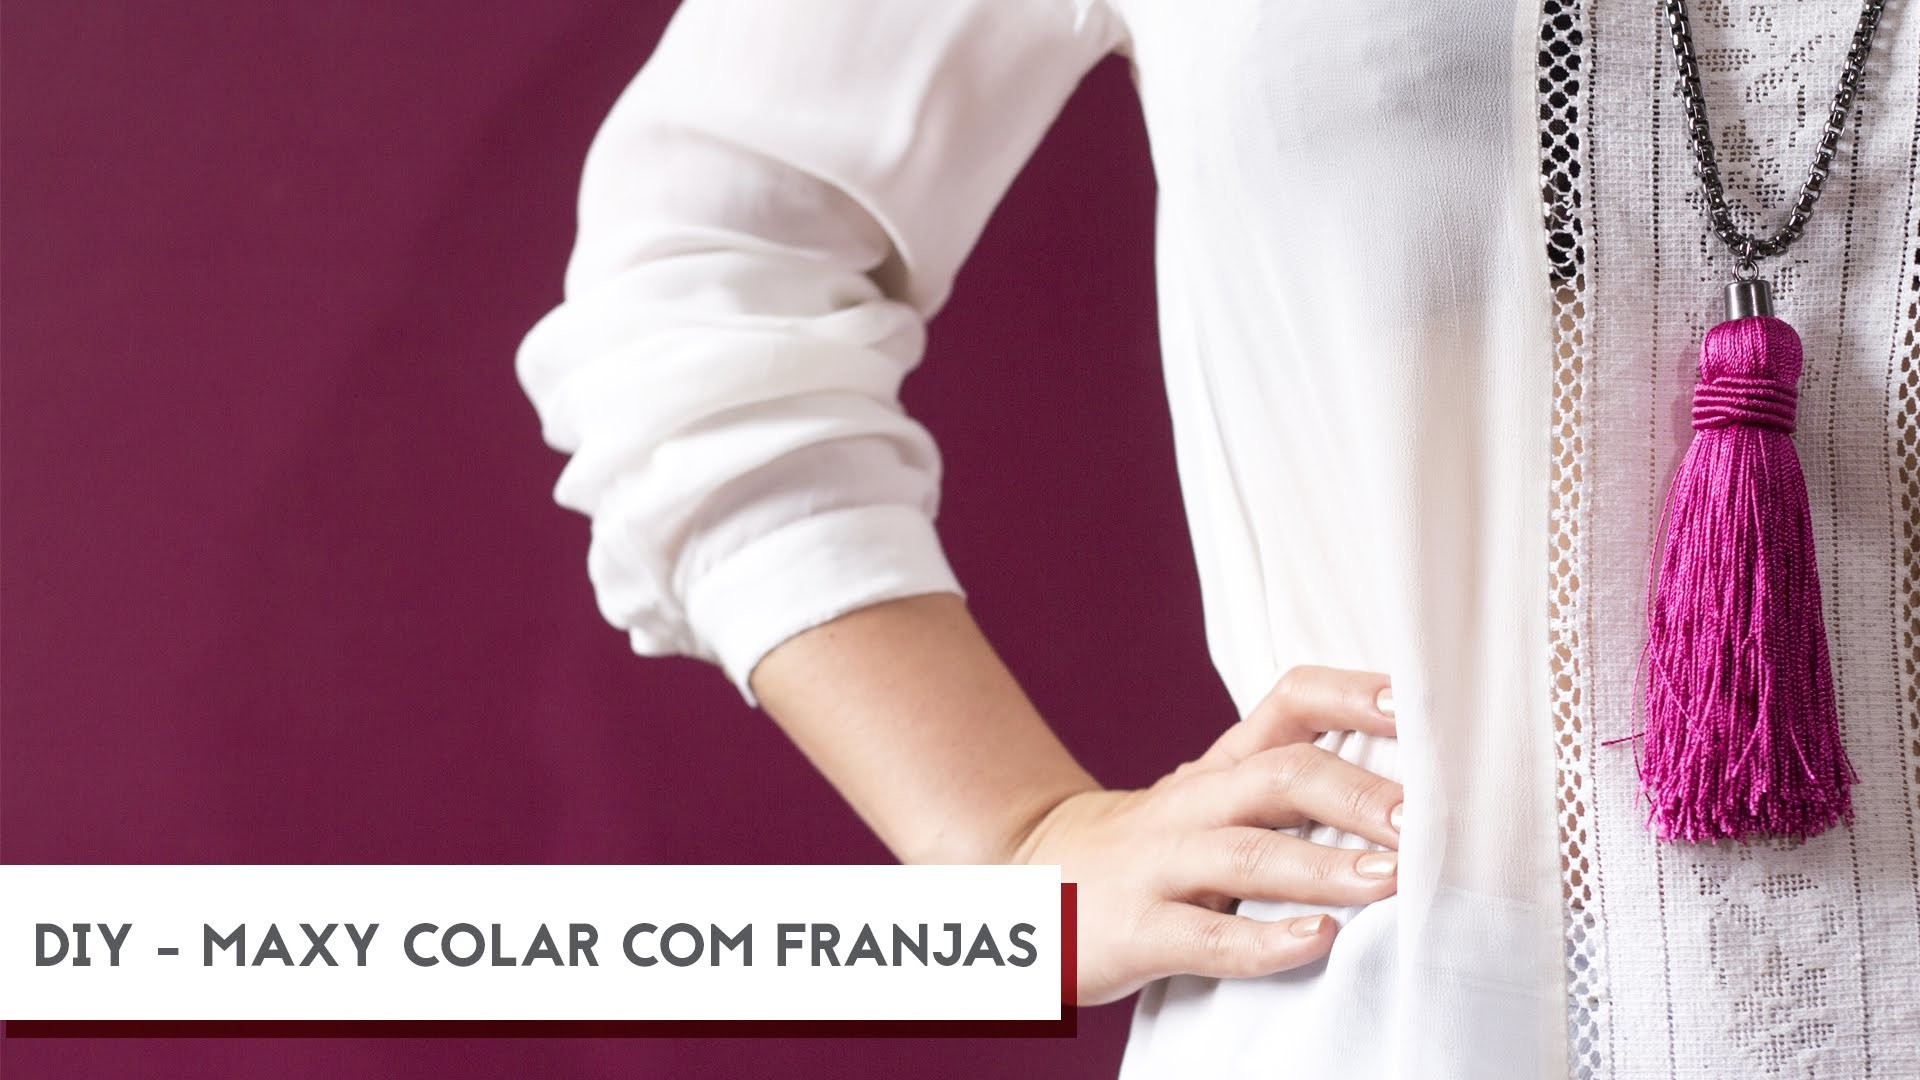 DIY - Maxi Colar de Franjas| Drops das Dez